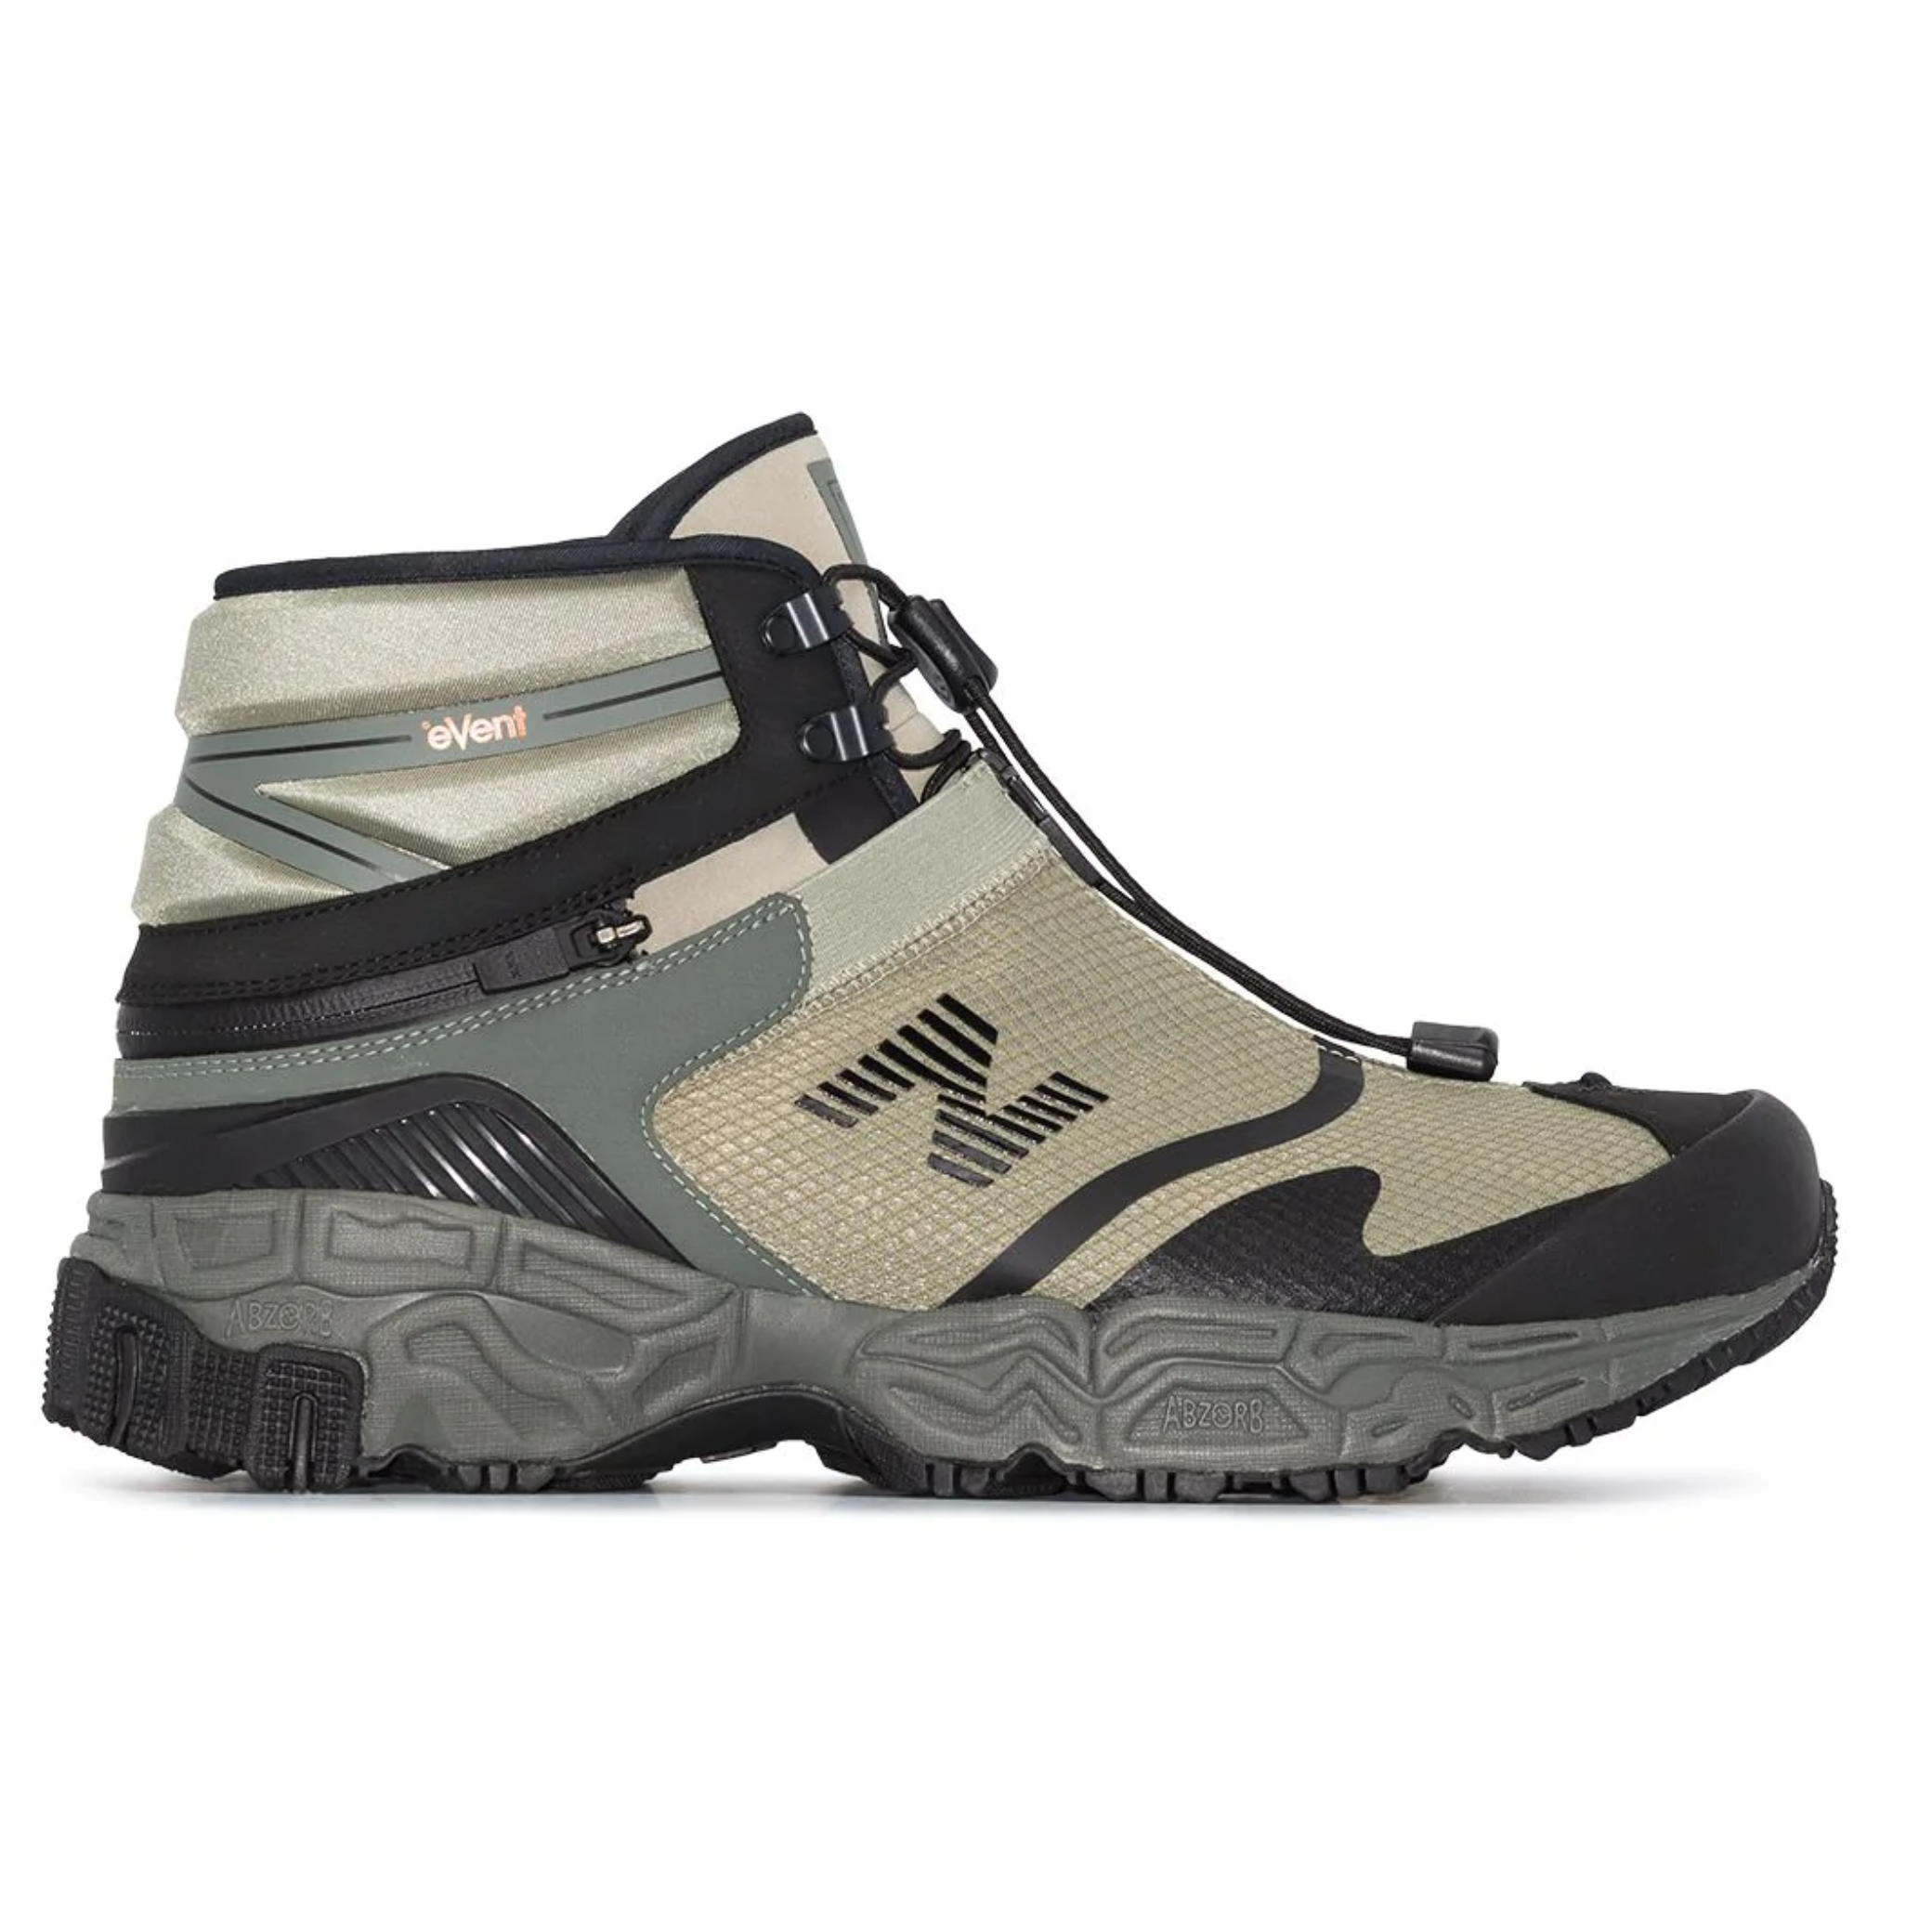 høst sko 1